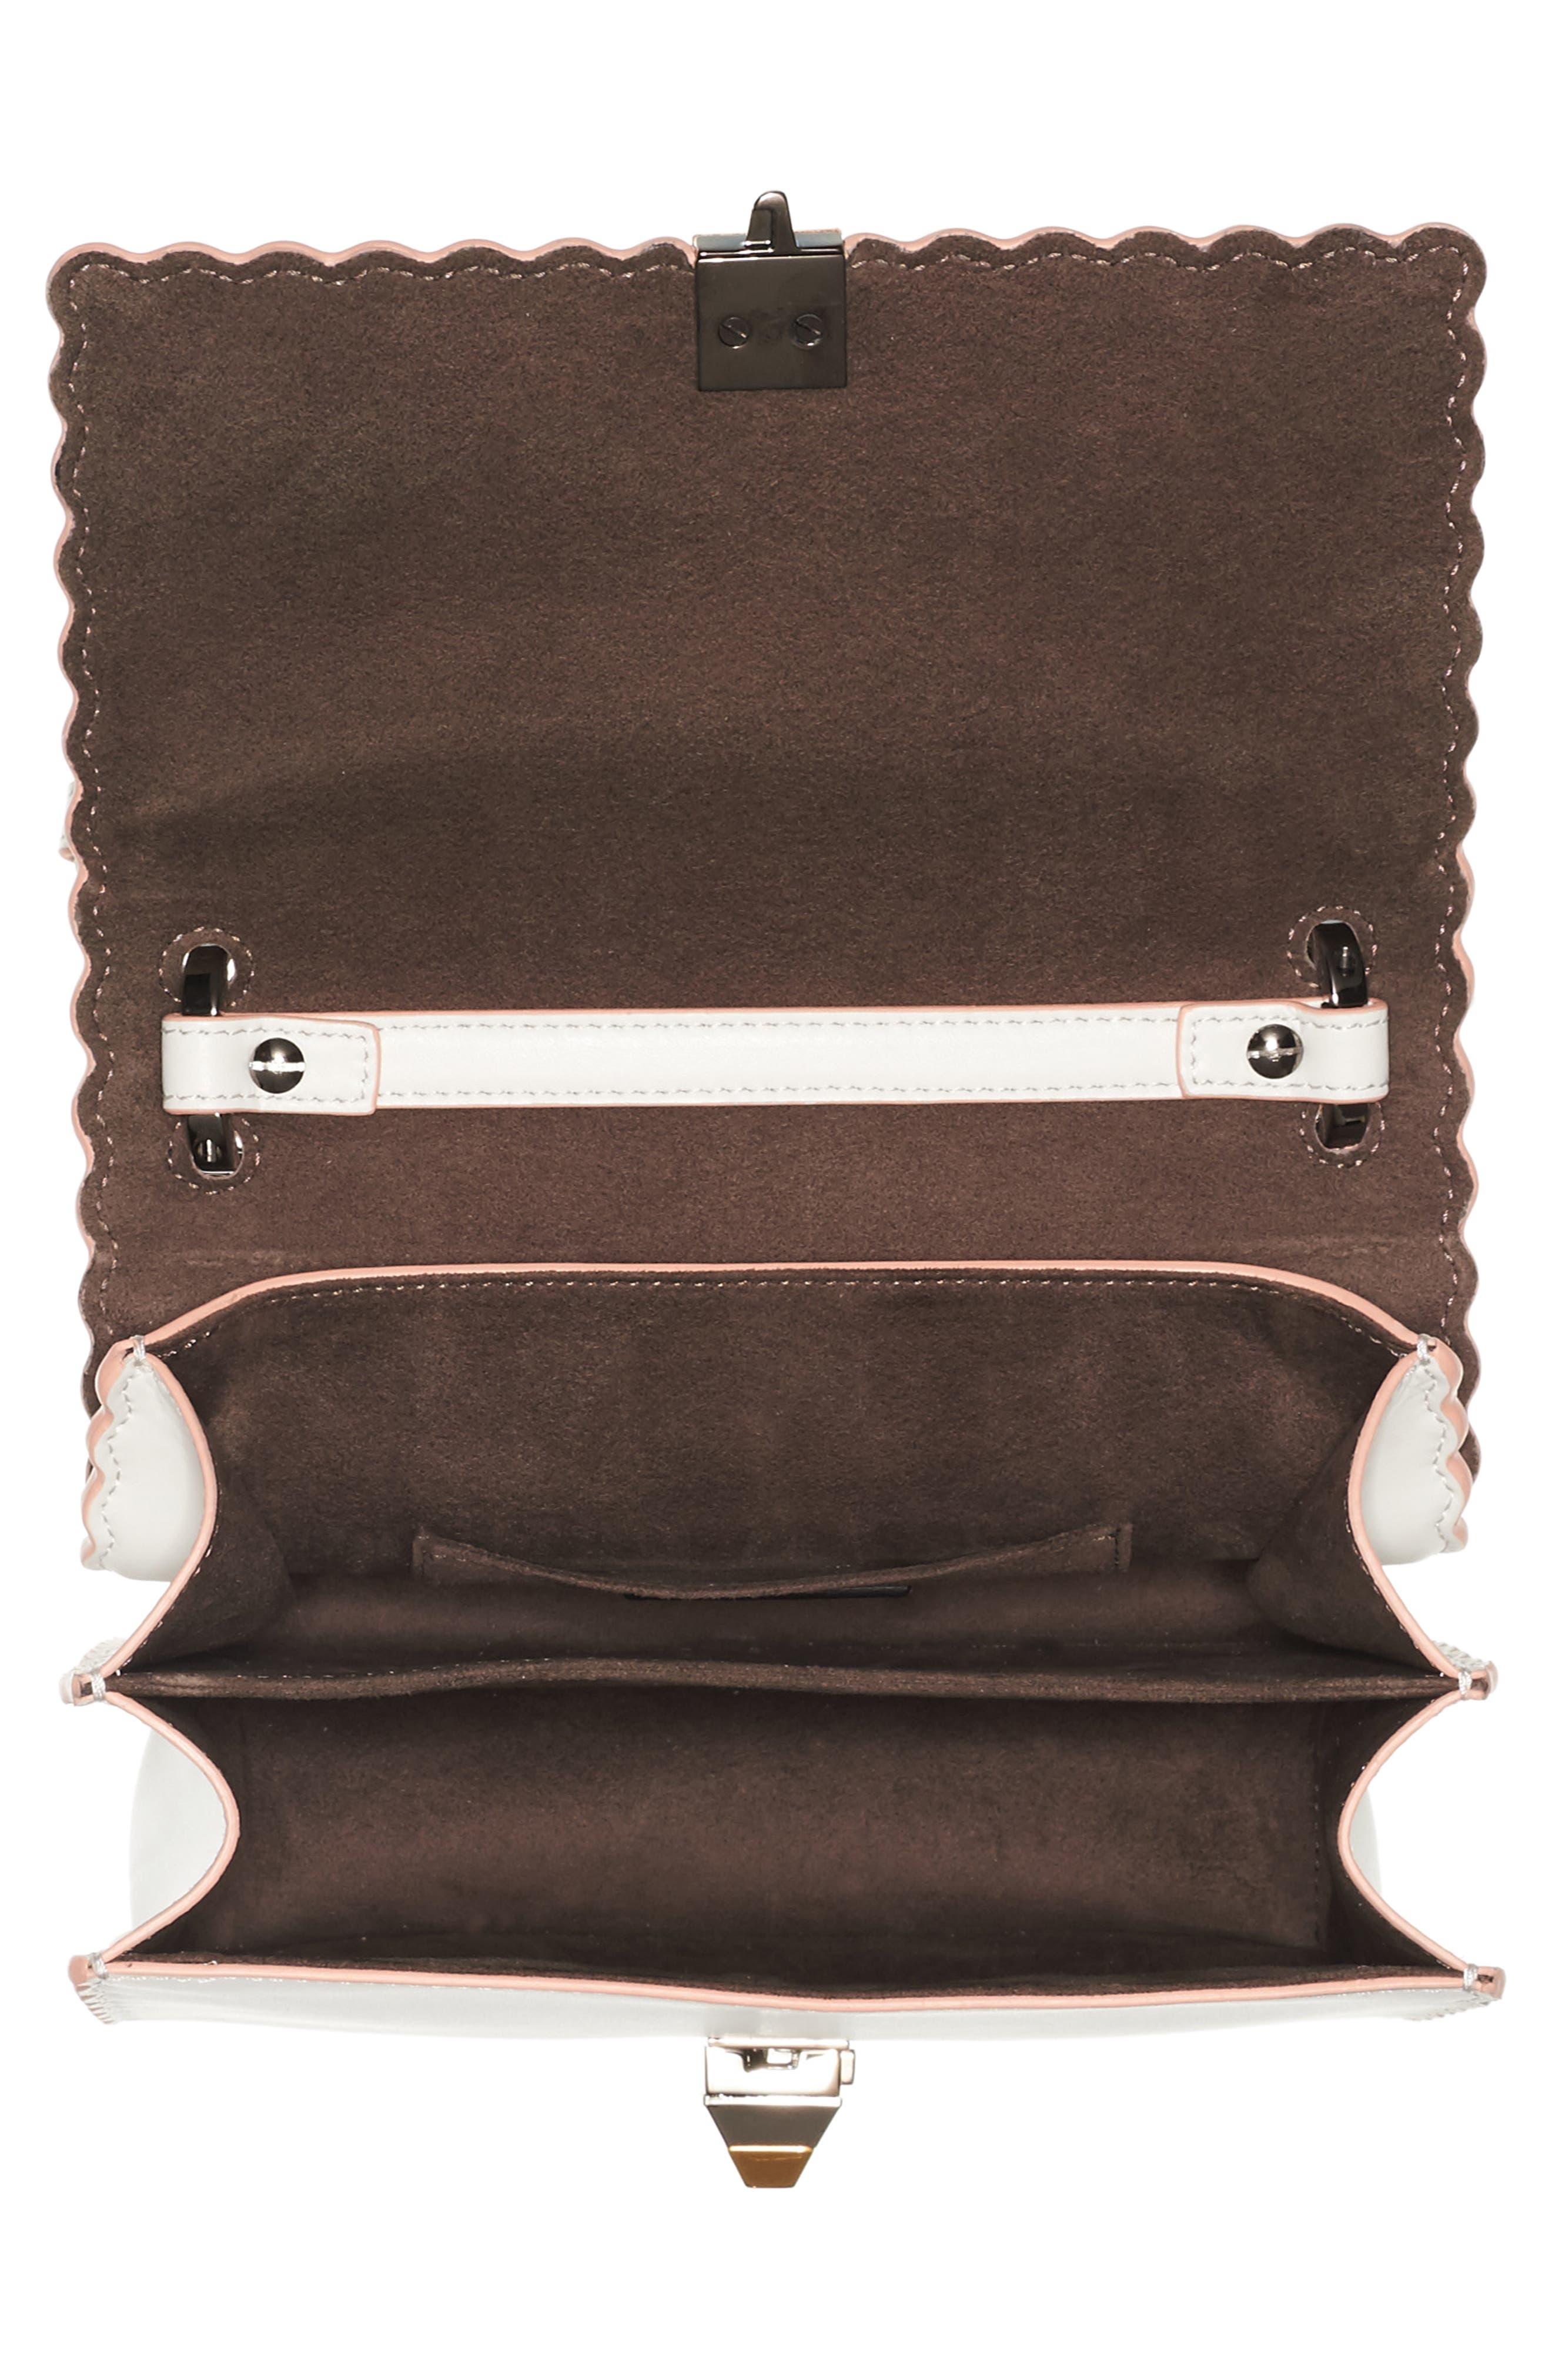 Mini Kan Scallop Genuine Snakeskin & Leather Shoulder Bag,                             Alternate thumbnail 3, color,                             TAUPE/ROMARO/WHITE